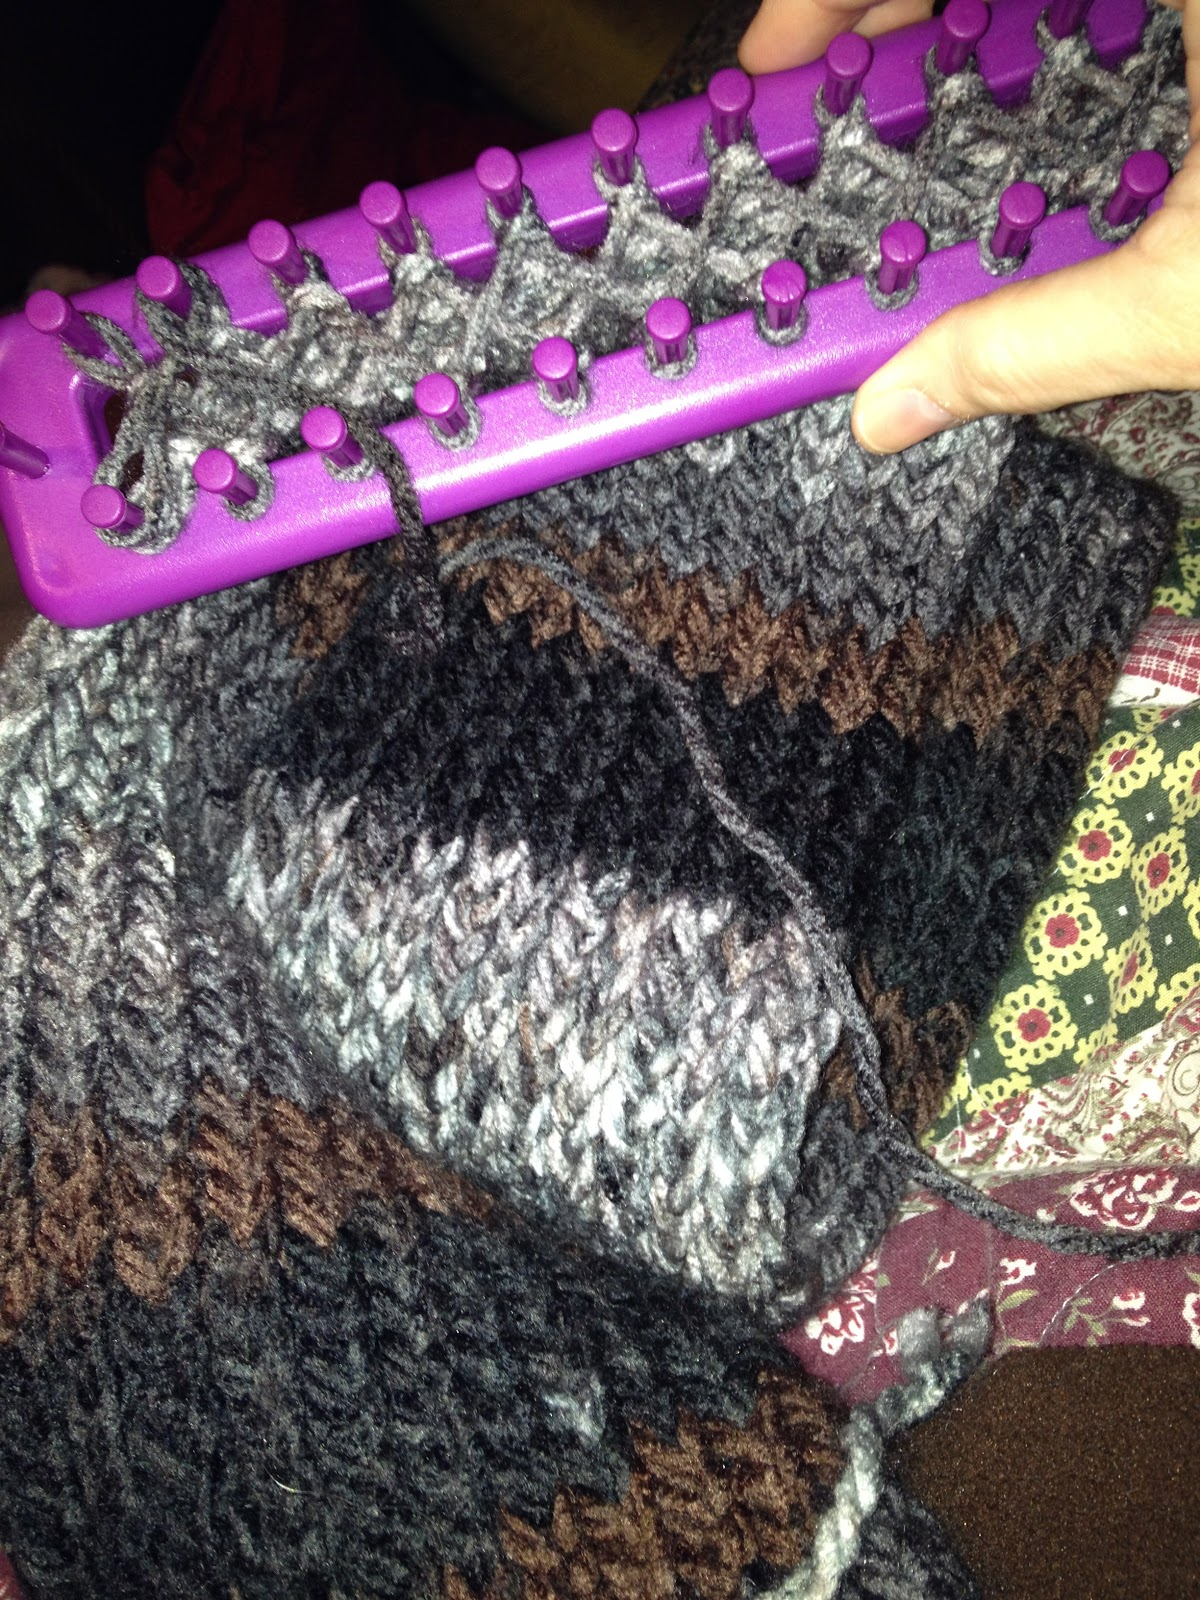 Crochet Ing Away Working With The Loom Trabajando Con